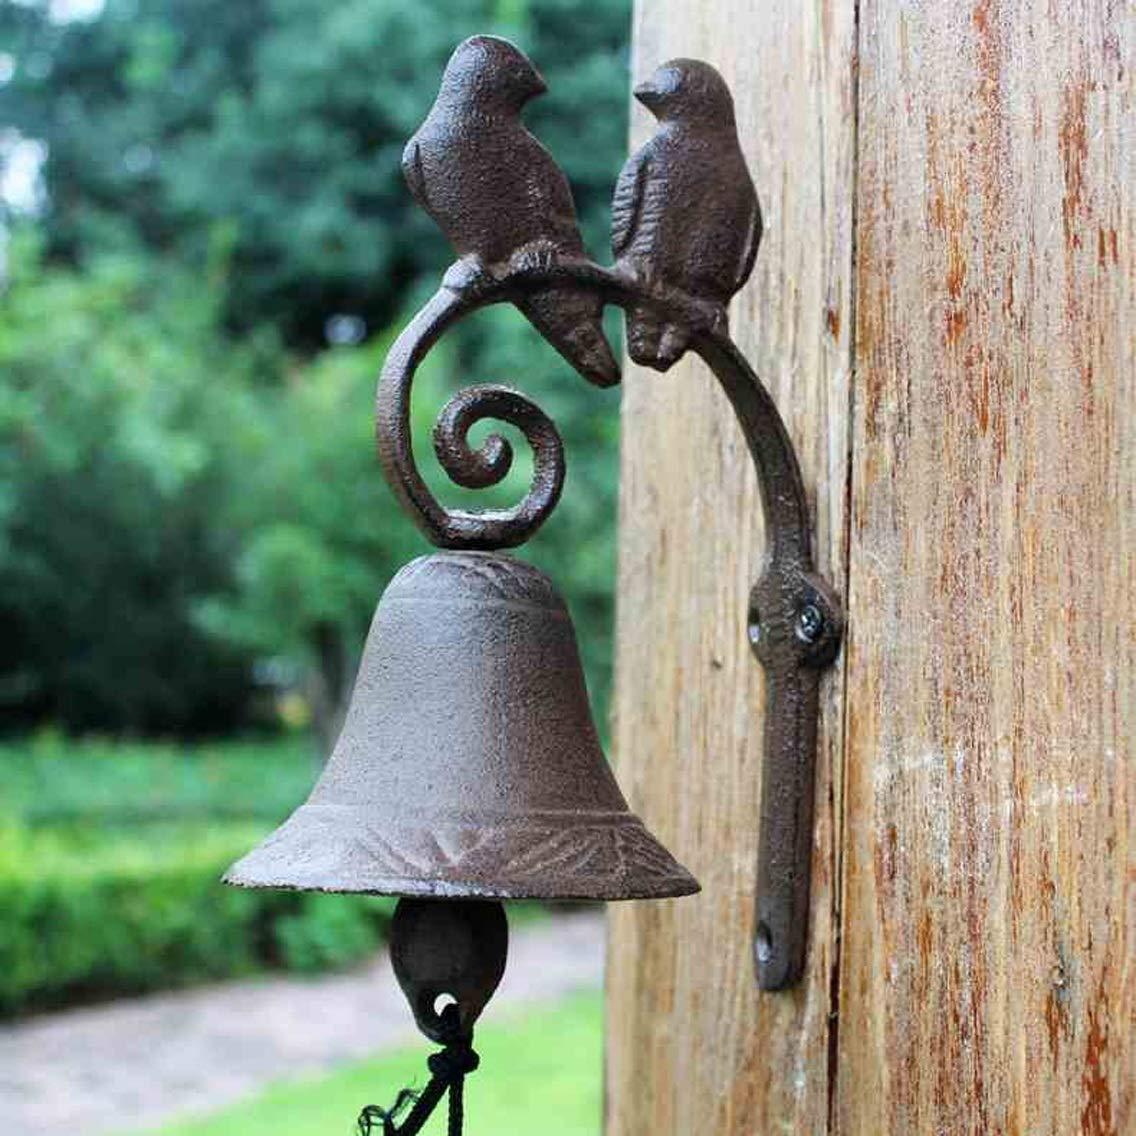 JTQMDD Love Bird Timbre de Hierro Forjado País Americano Jardín Vintage Hierro Campana Hierro Fundido Campana Hecha A Mano Jardín Timbre de la Puerta 9.5x15x23cm Timbre de la Puerta de Hierro Fundido: